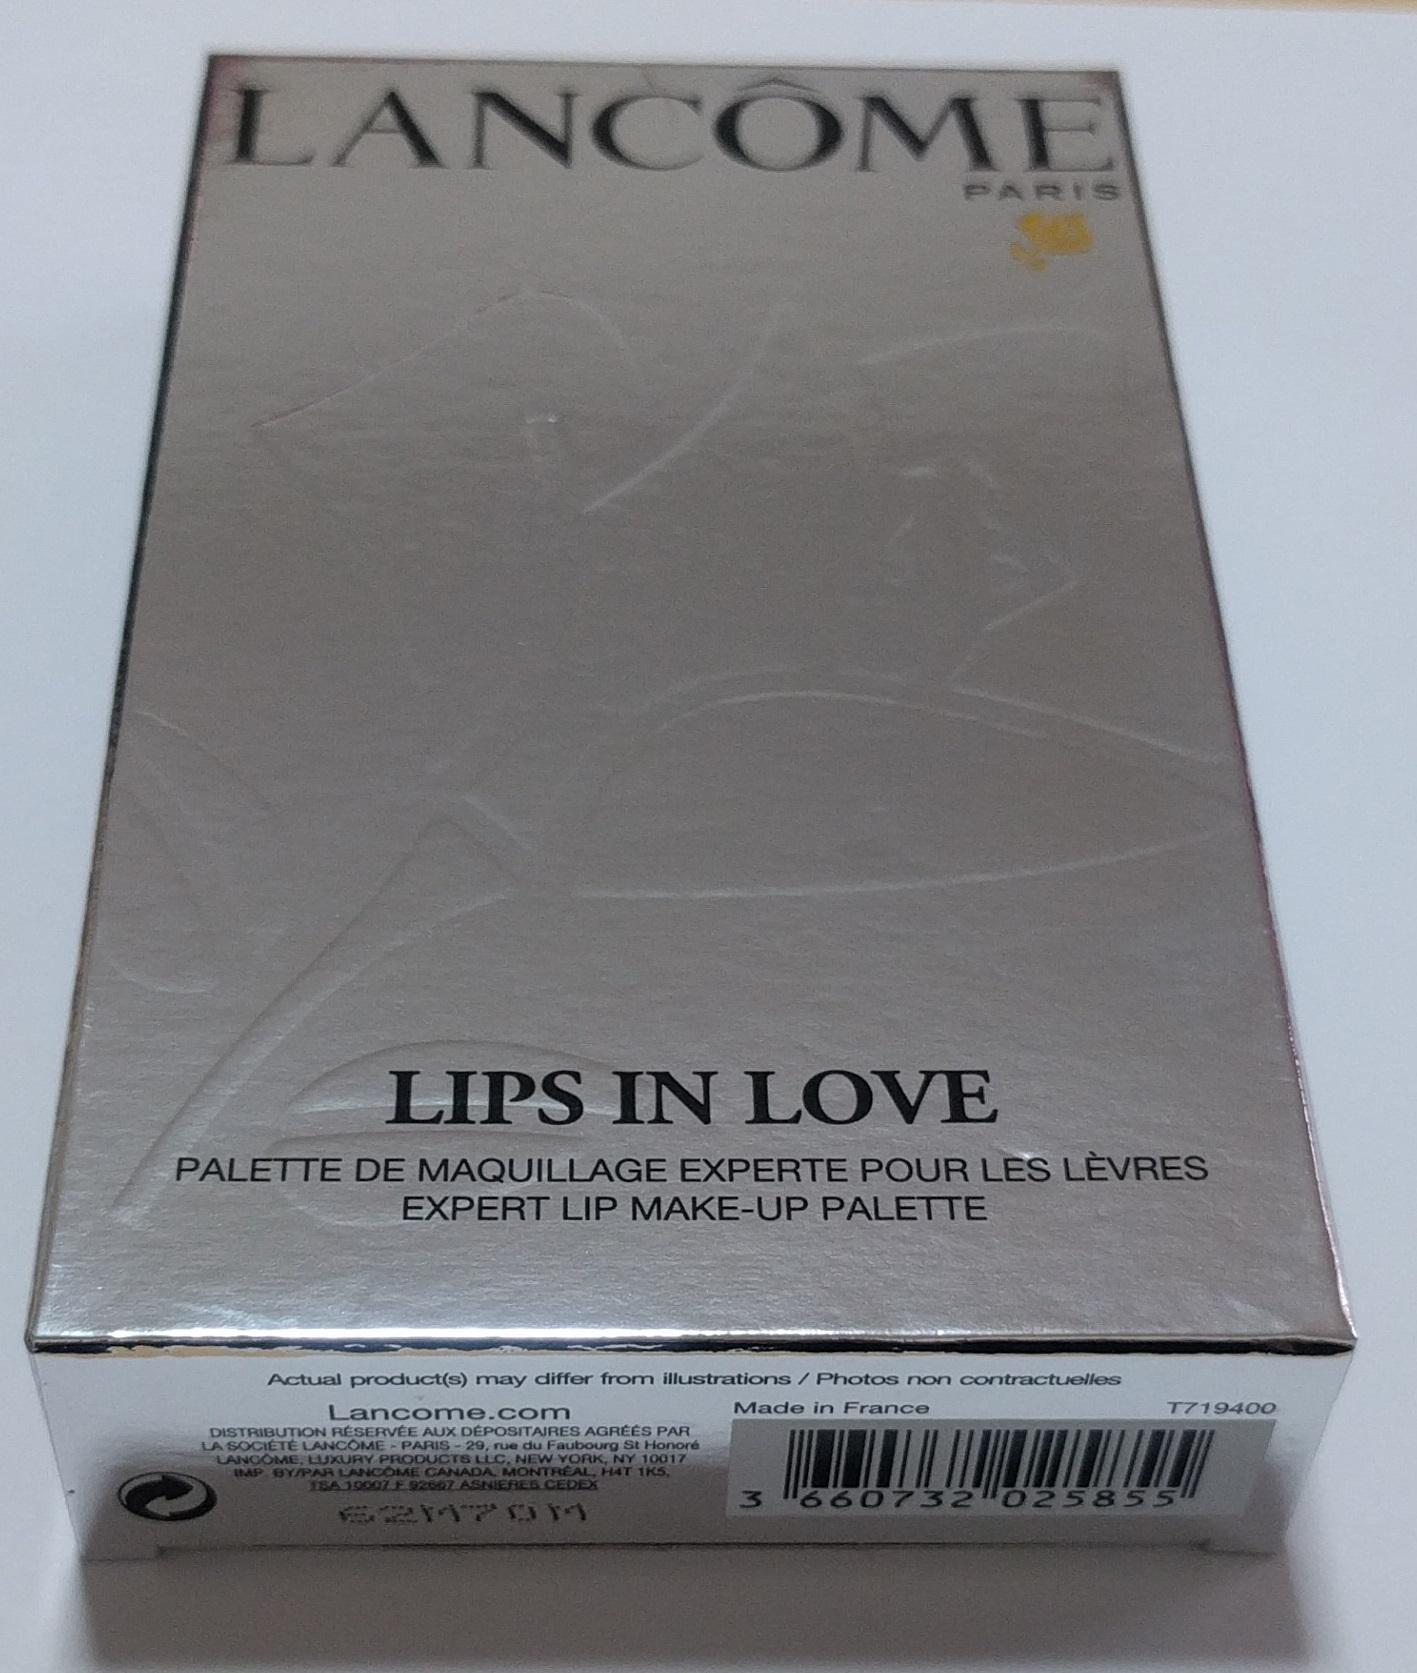 lancome003